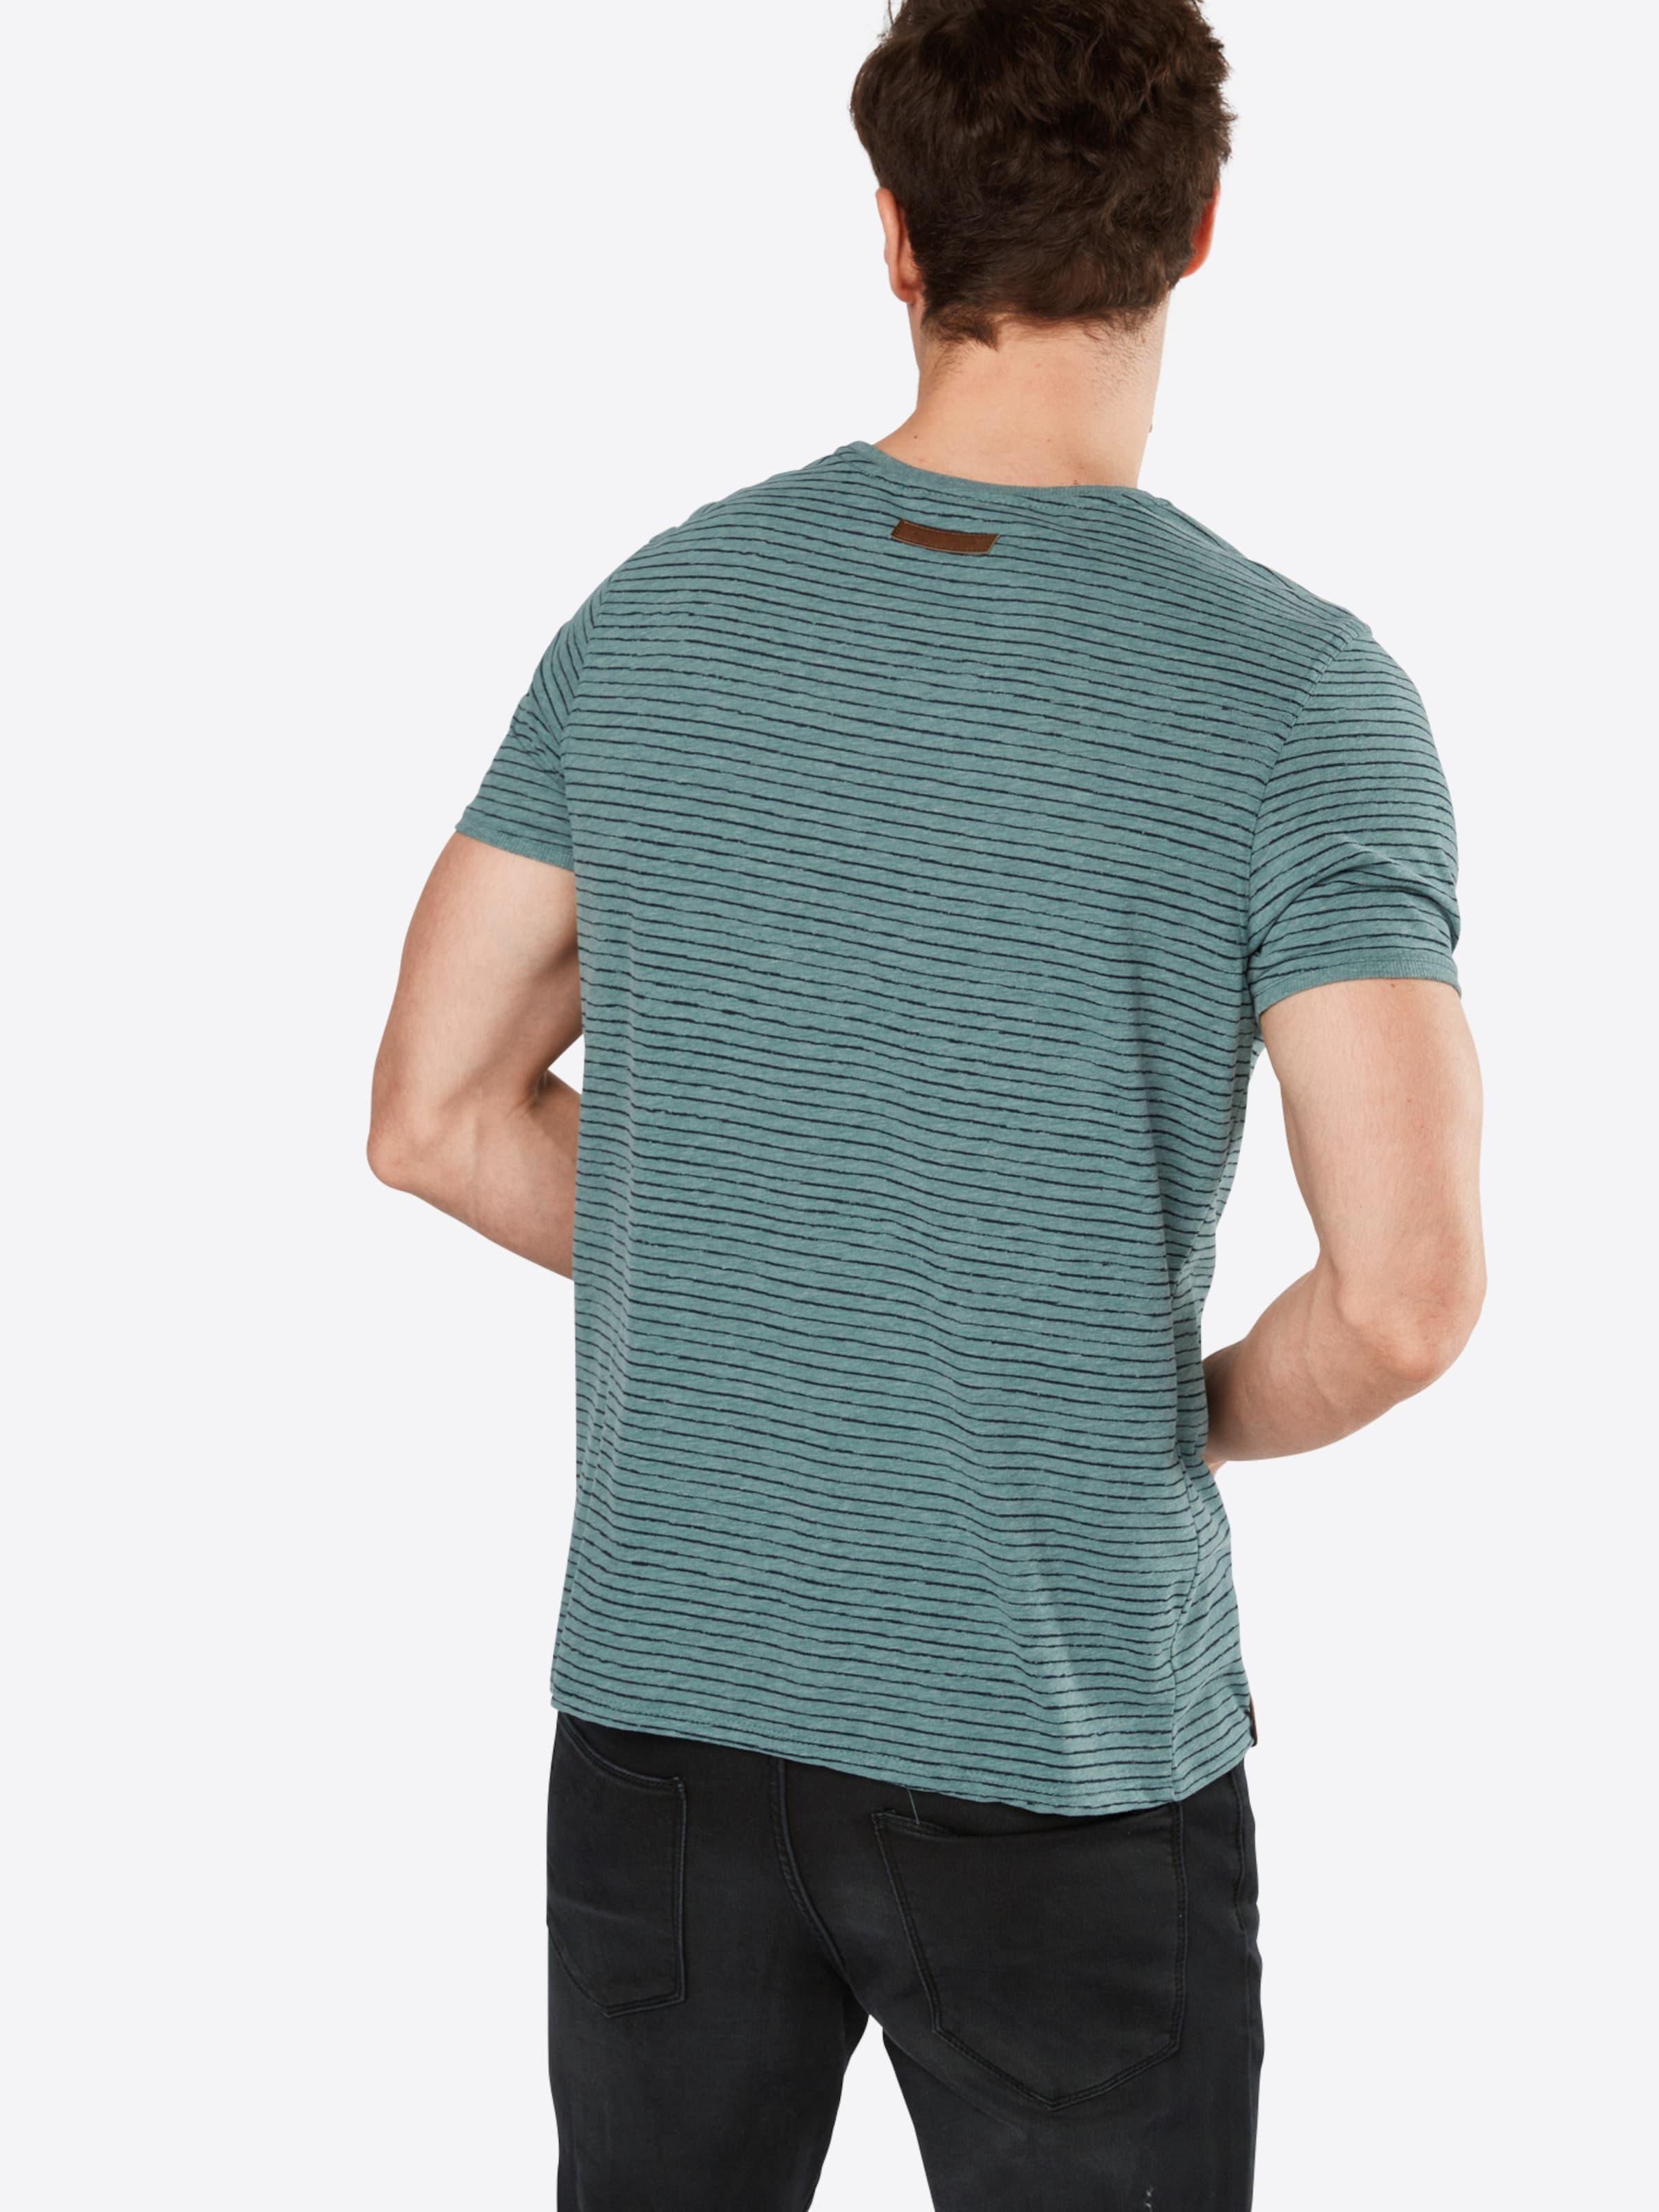 naketano Male T-Shirt Verkauf Eastbay jhr1lN